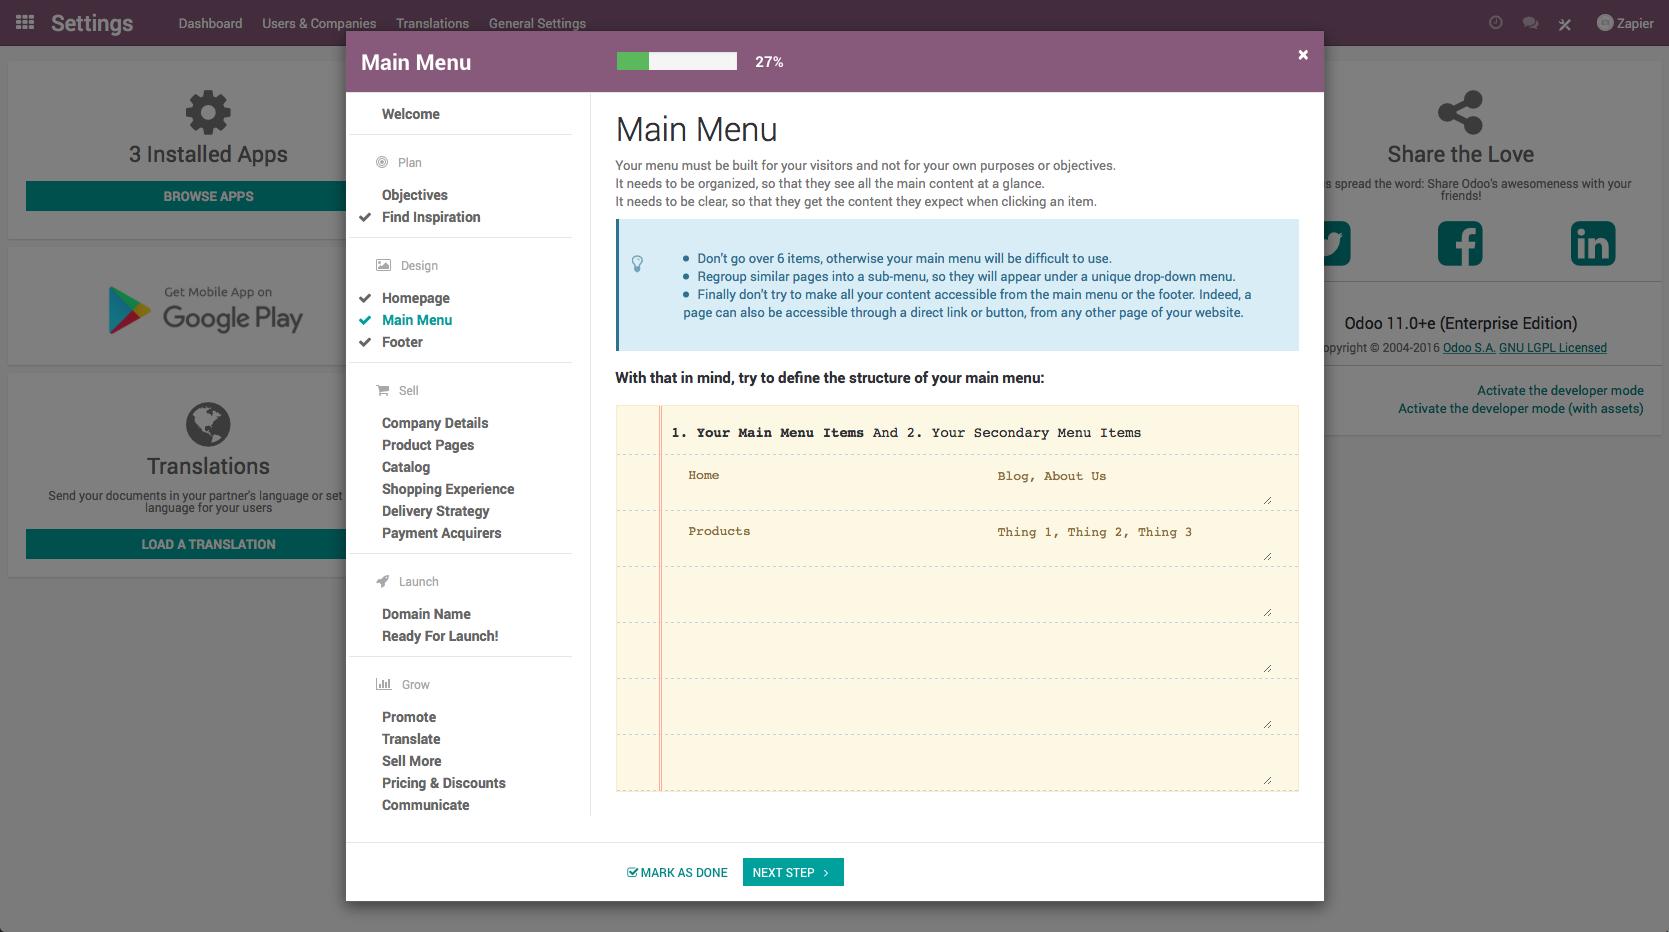 Odoo CRM Screenshot Examples & Demo Videos | Zapier